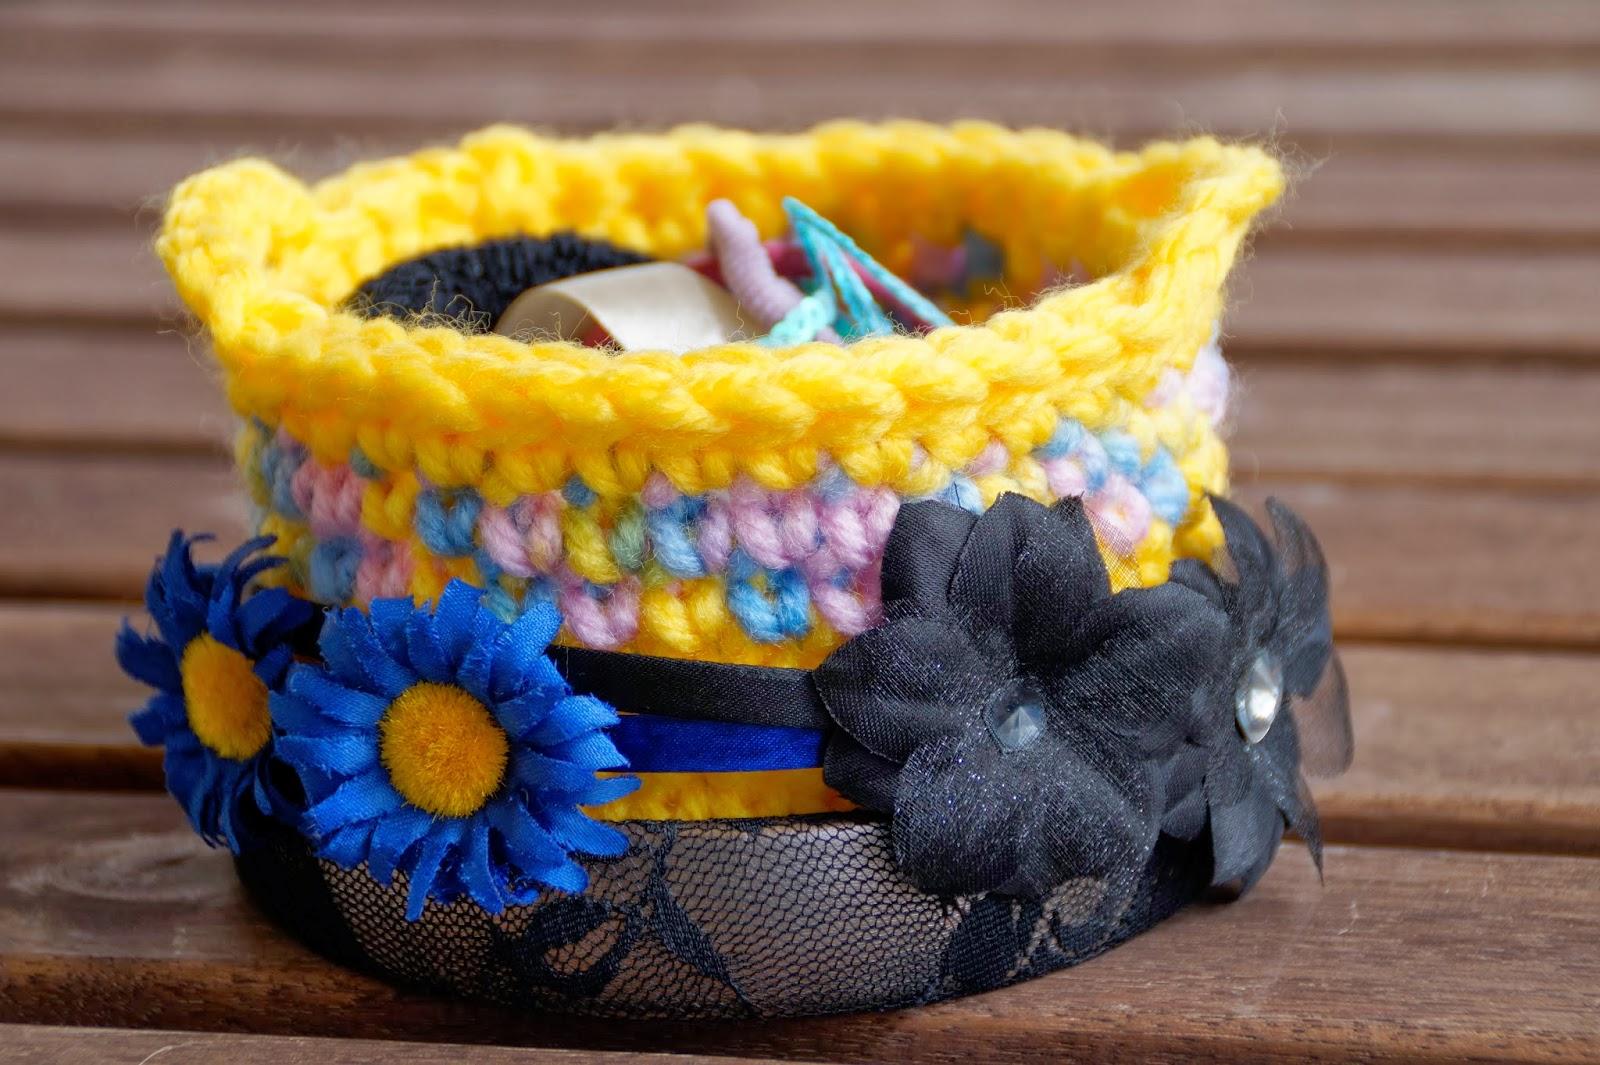 Mi mundo de baldosas amarillas cesta de ganchillo con patr n - Cestas de ganchillo ...